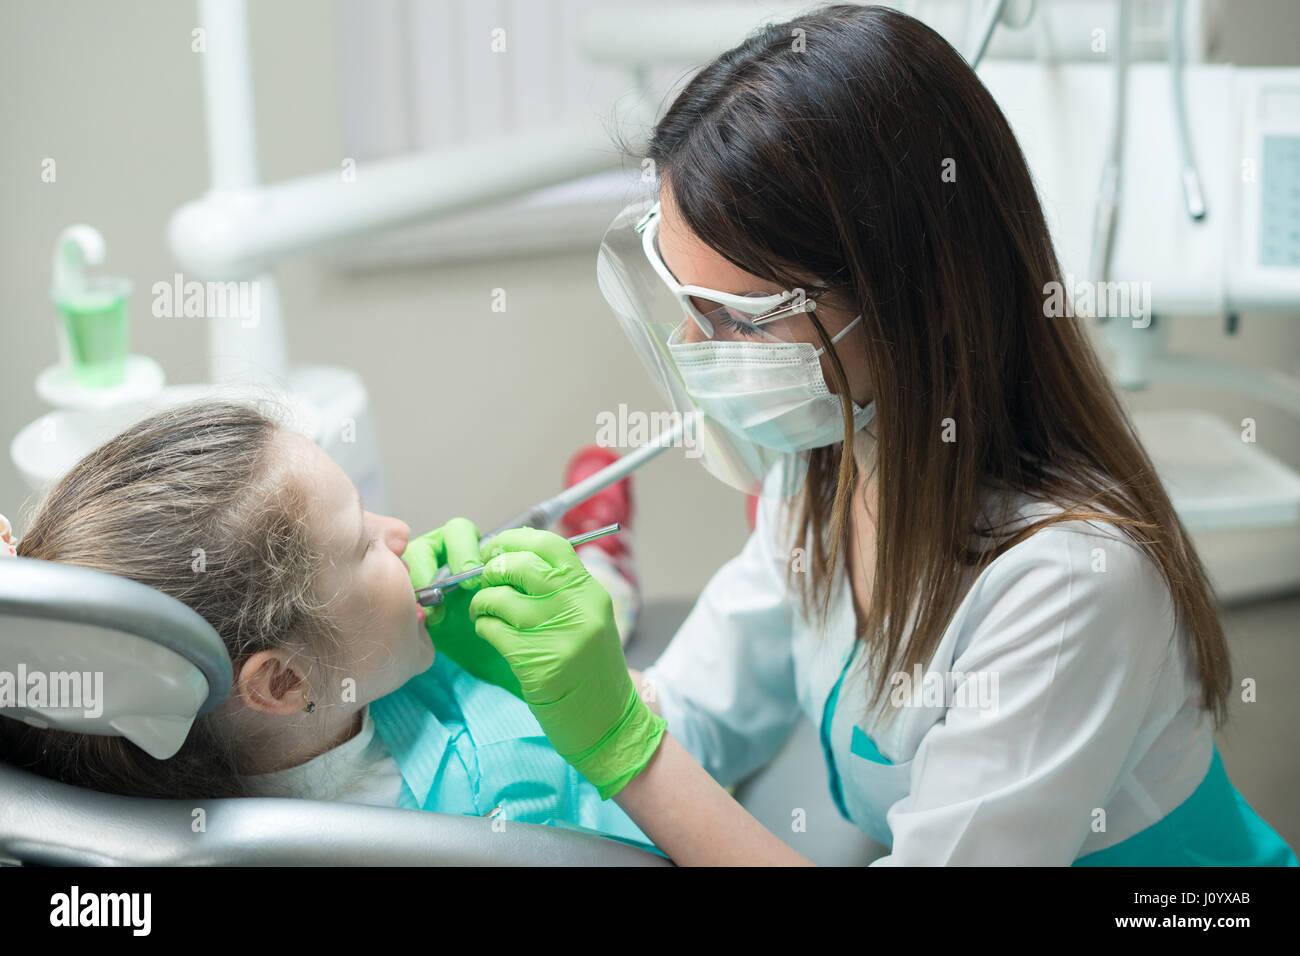 dentist treating child's teeth - Stock Image